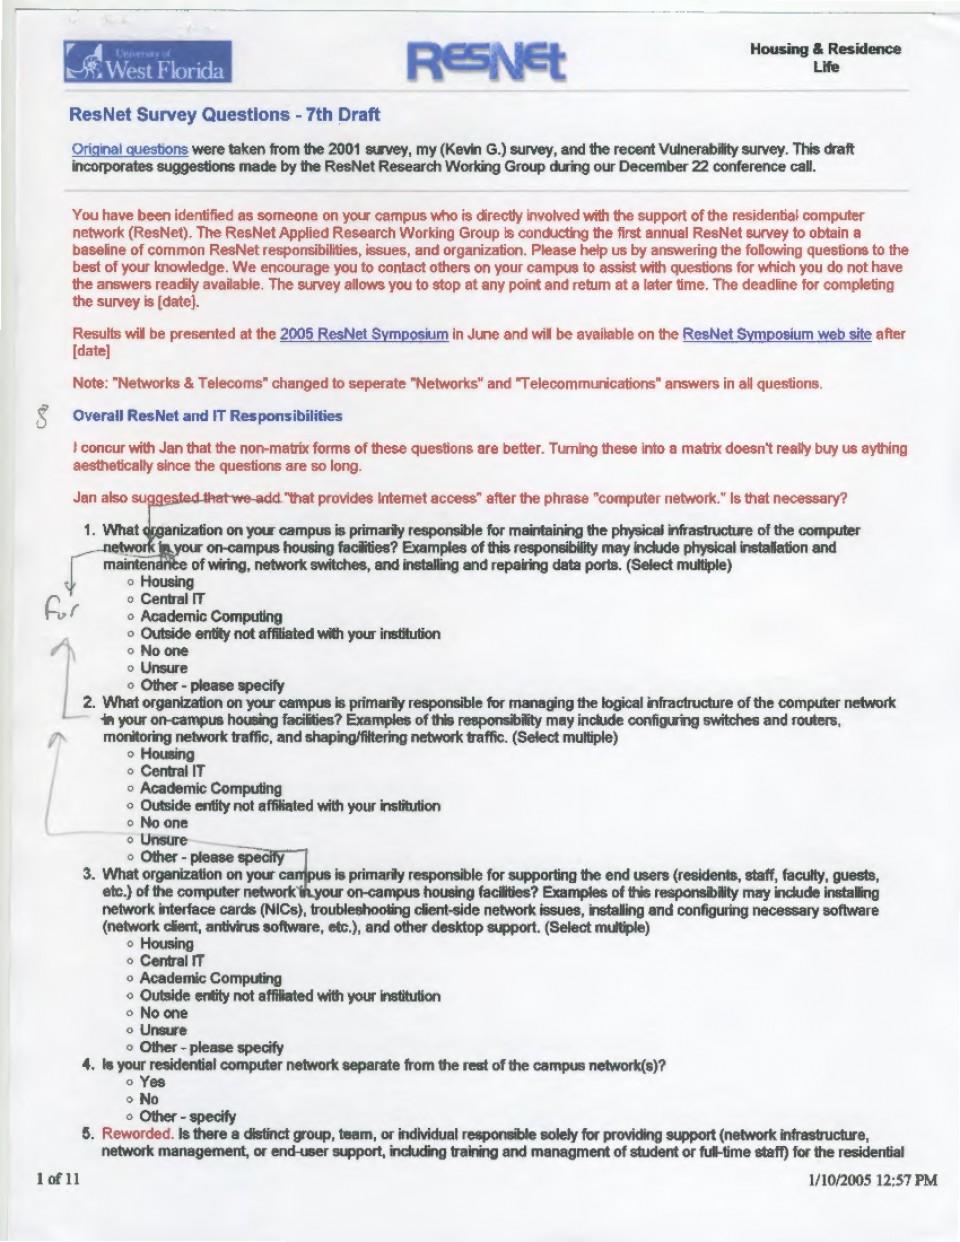 008 Essay Example Checker Free Online Originality Check Turnitin Macquarie College Resnet Survey Draft Amazing Sentence Grammar Plagiarism Document 960